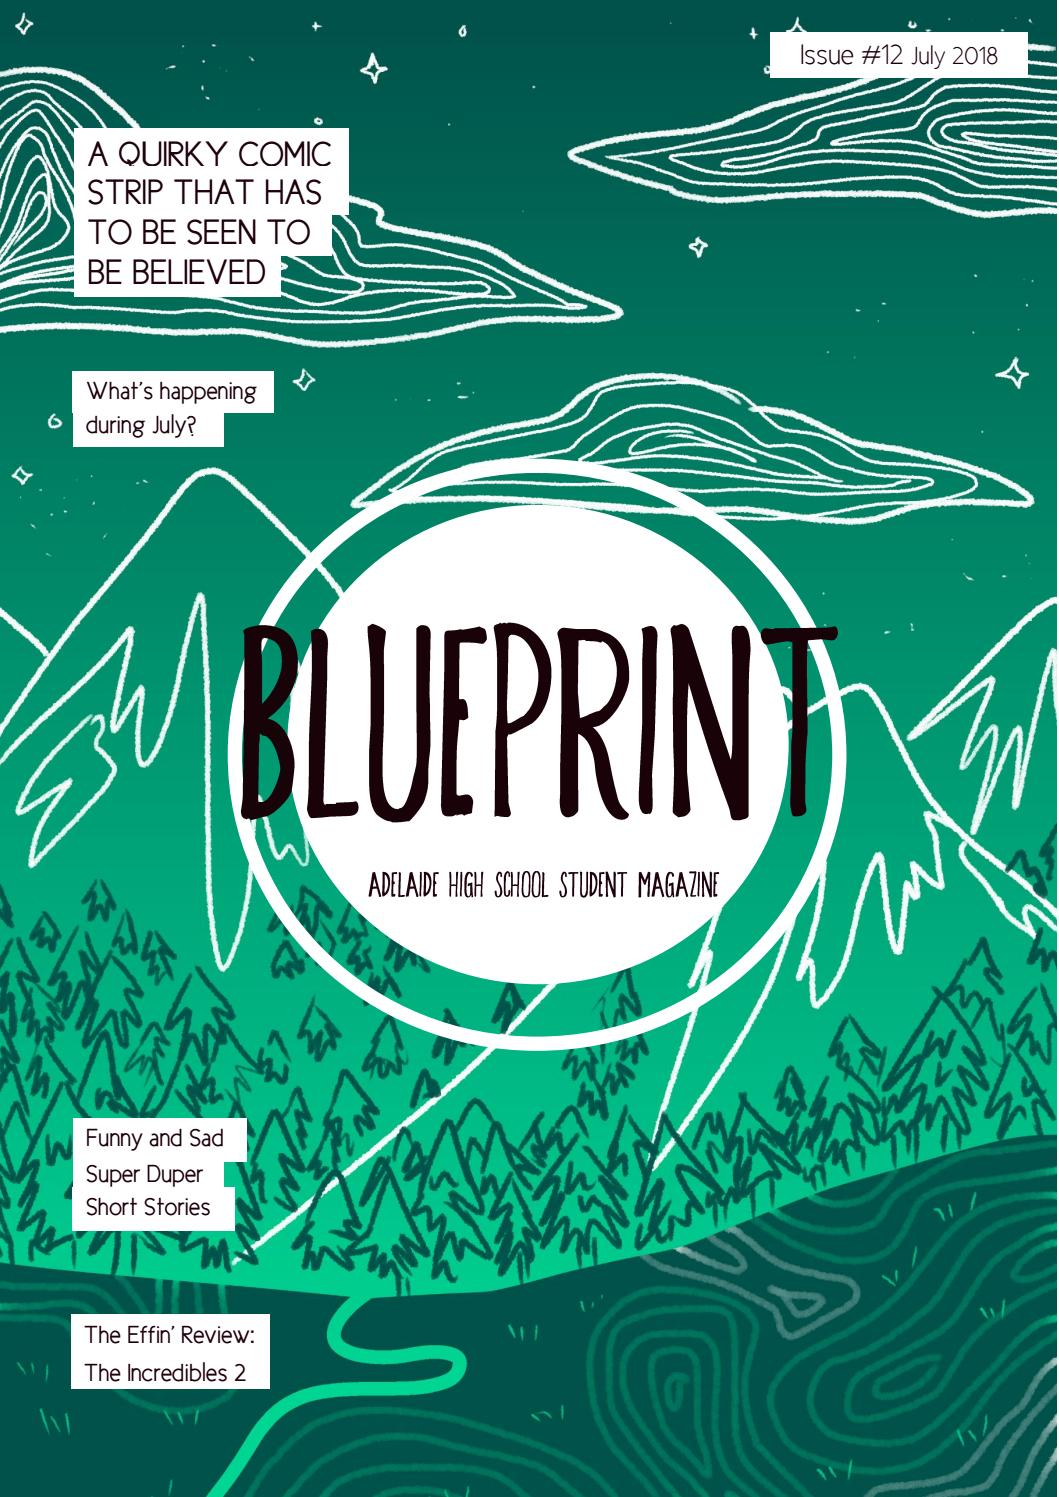 Blueprint student magazine issue 12 by Adelaide High School - issuu